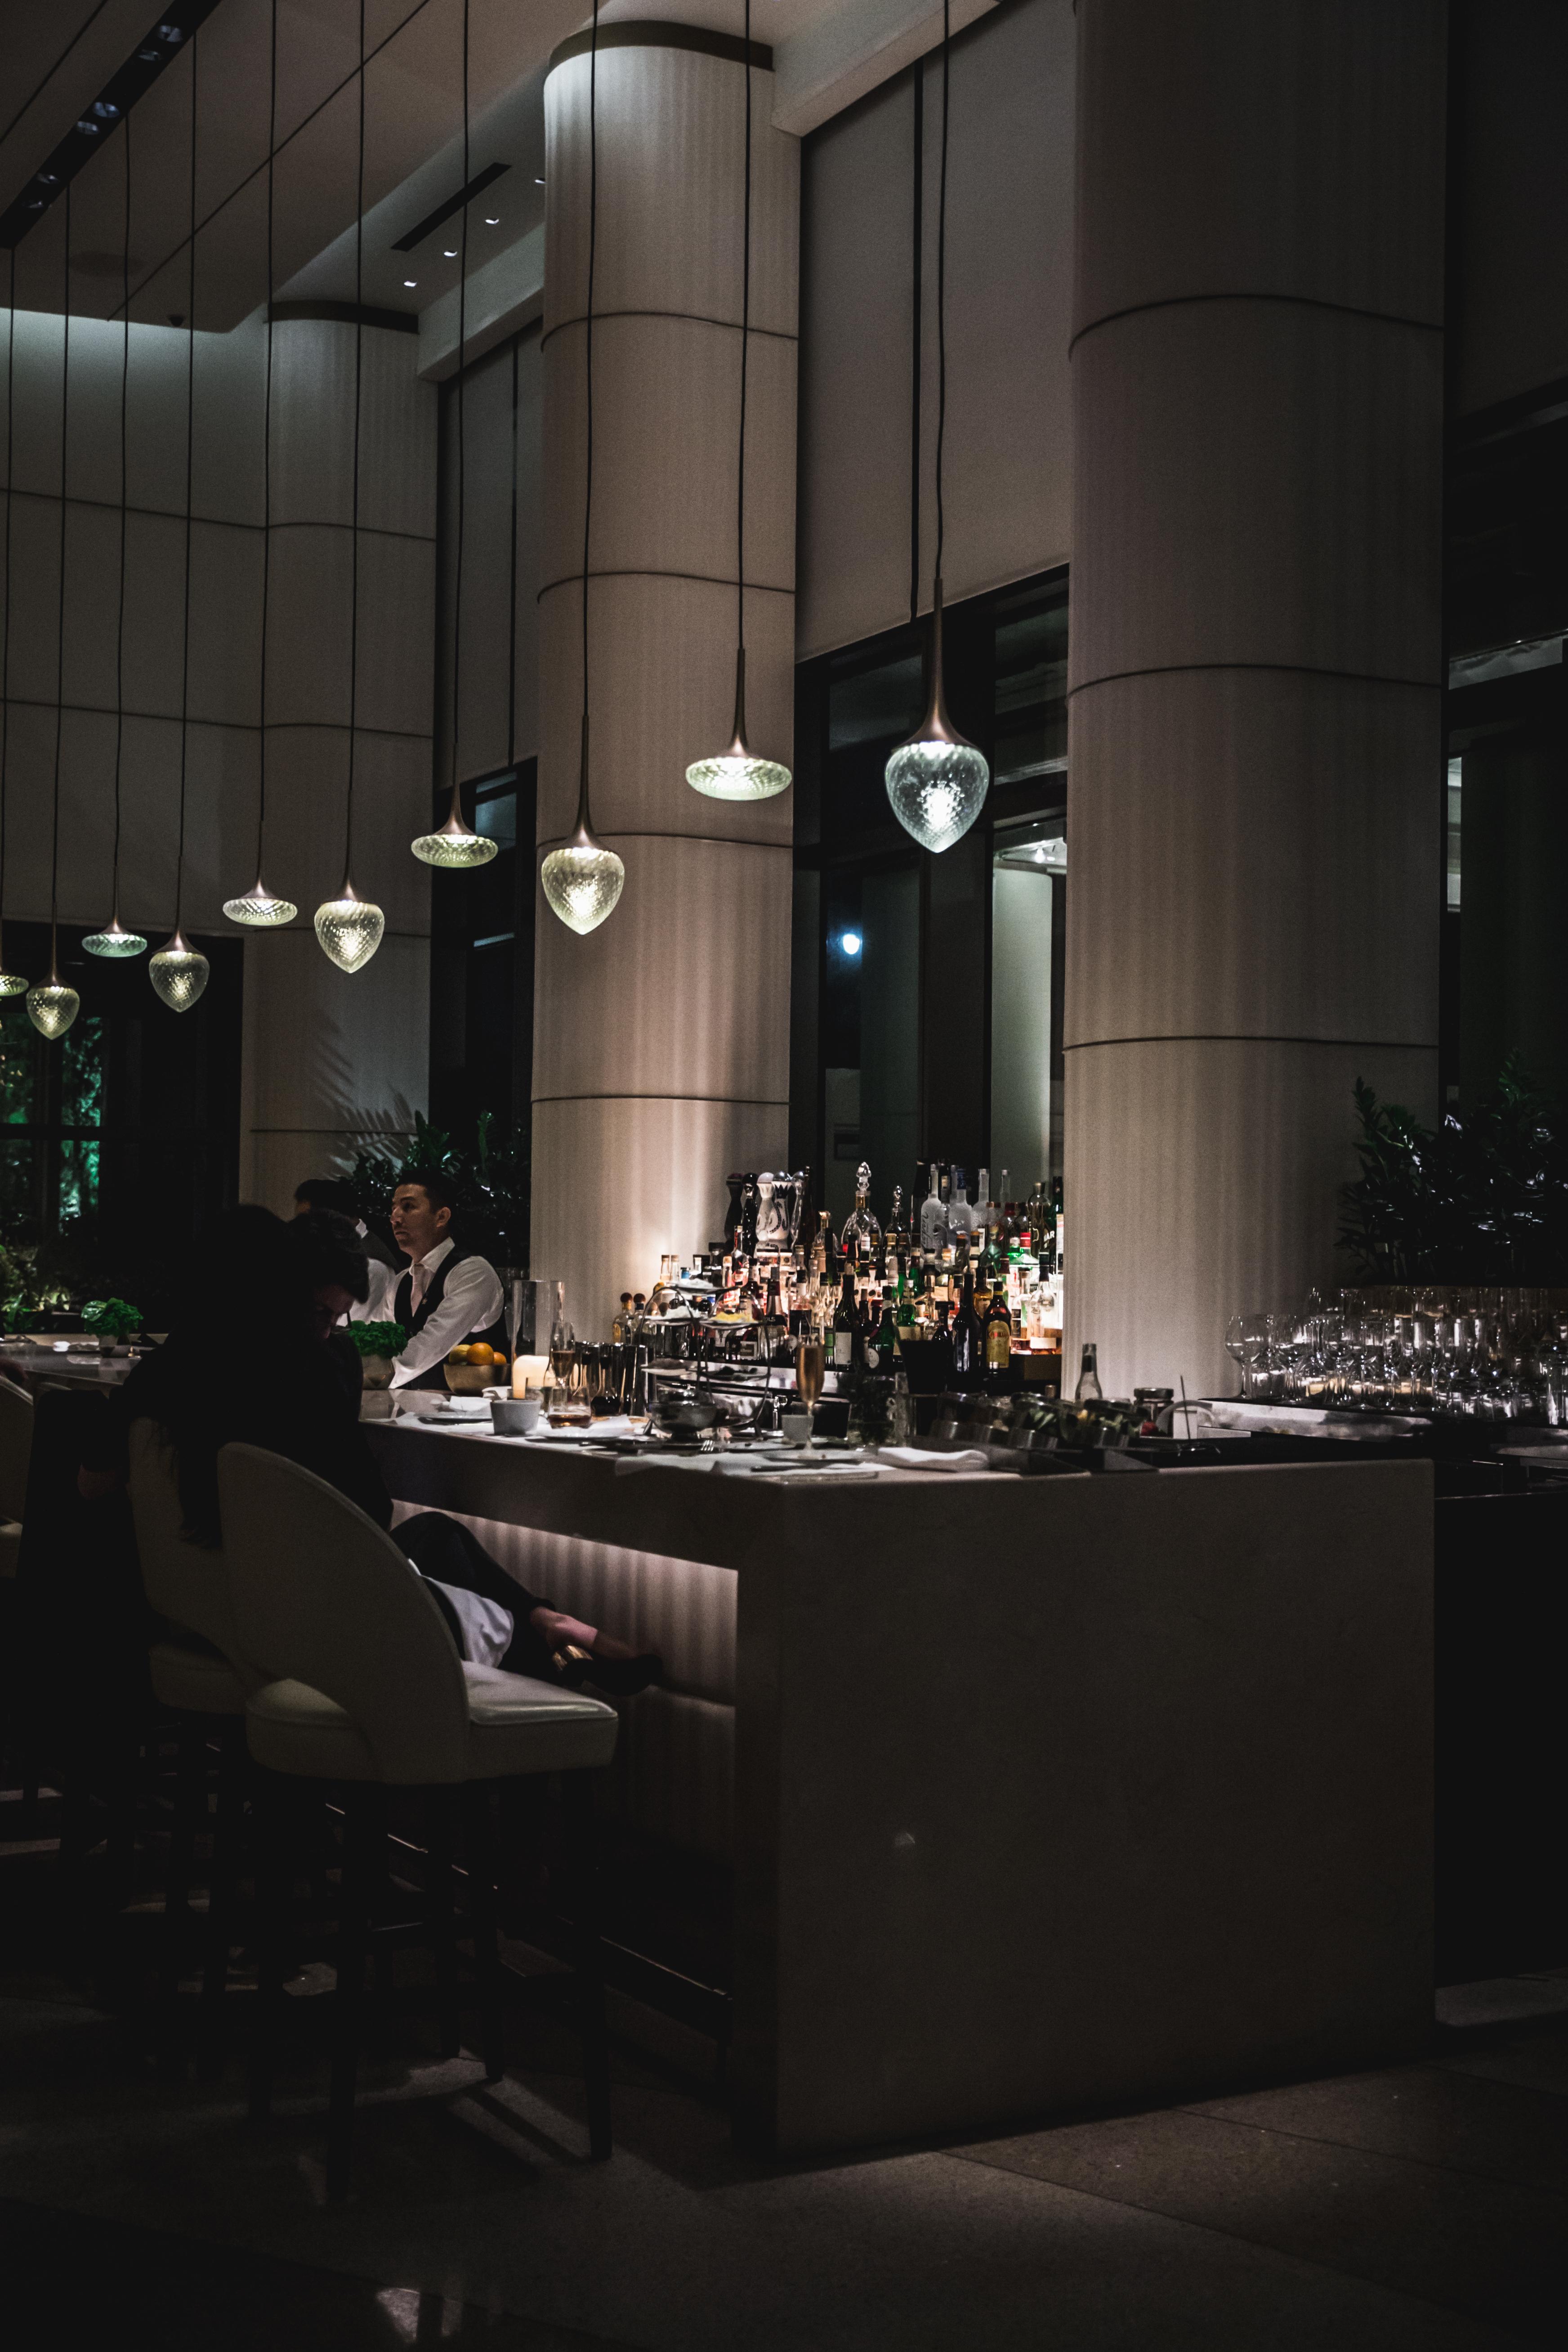 Mégane Arderighi - Jean-Georges restaurant Los Angeles